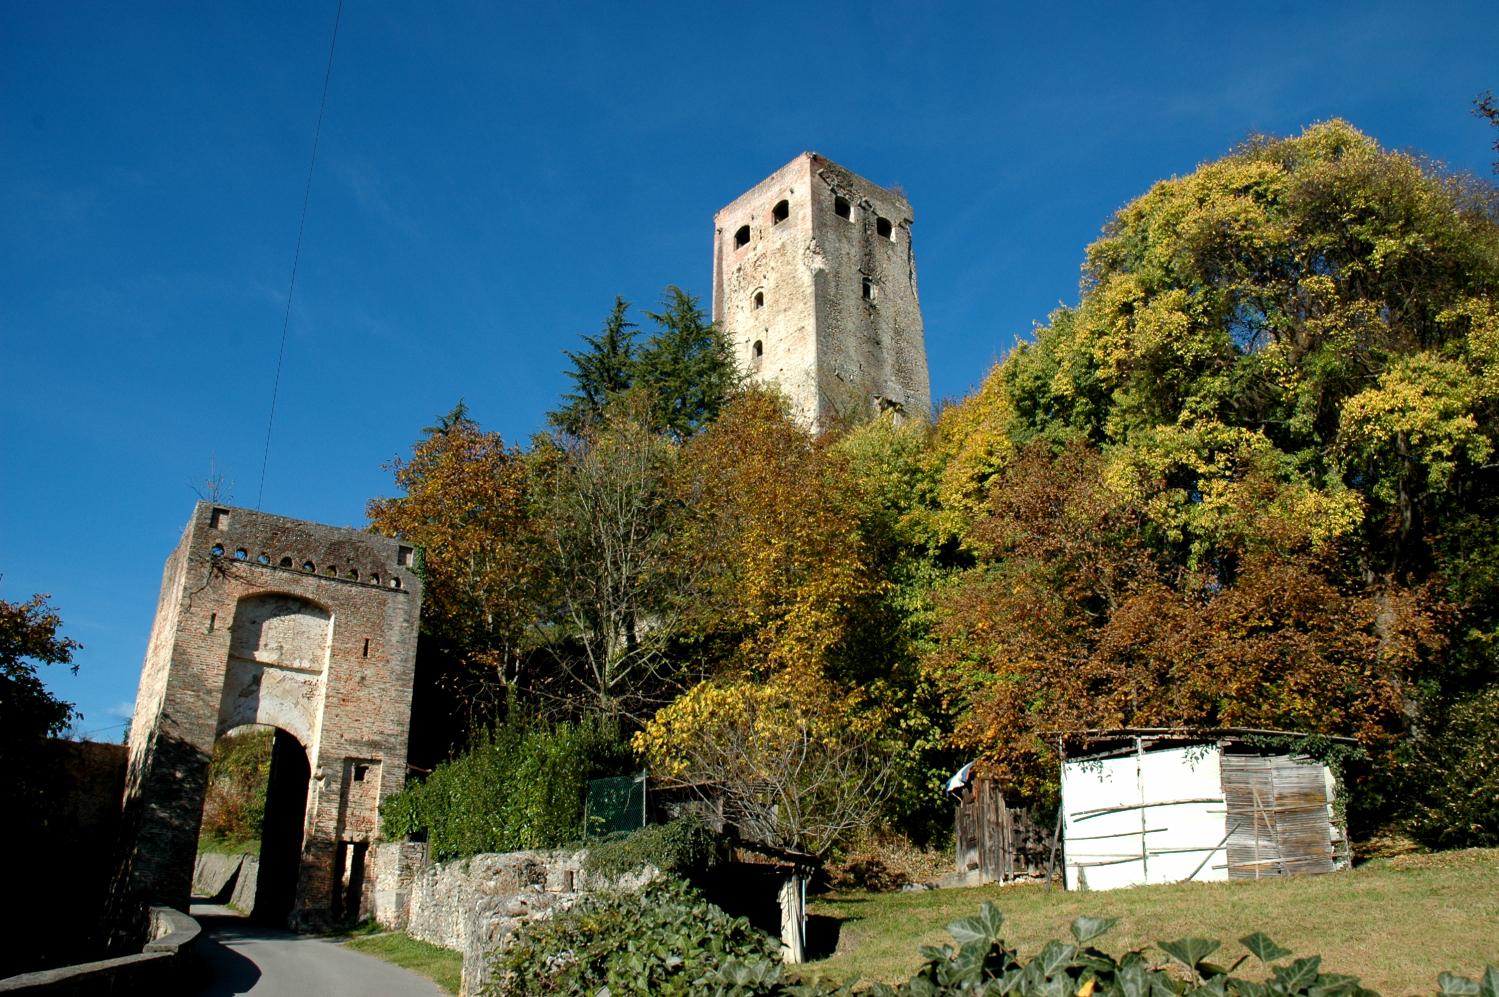 The ruins of the older Collalto Castle, in the village of Collalto